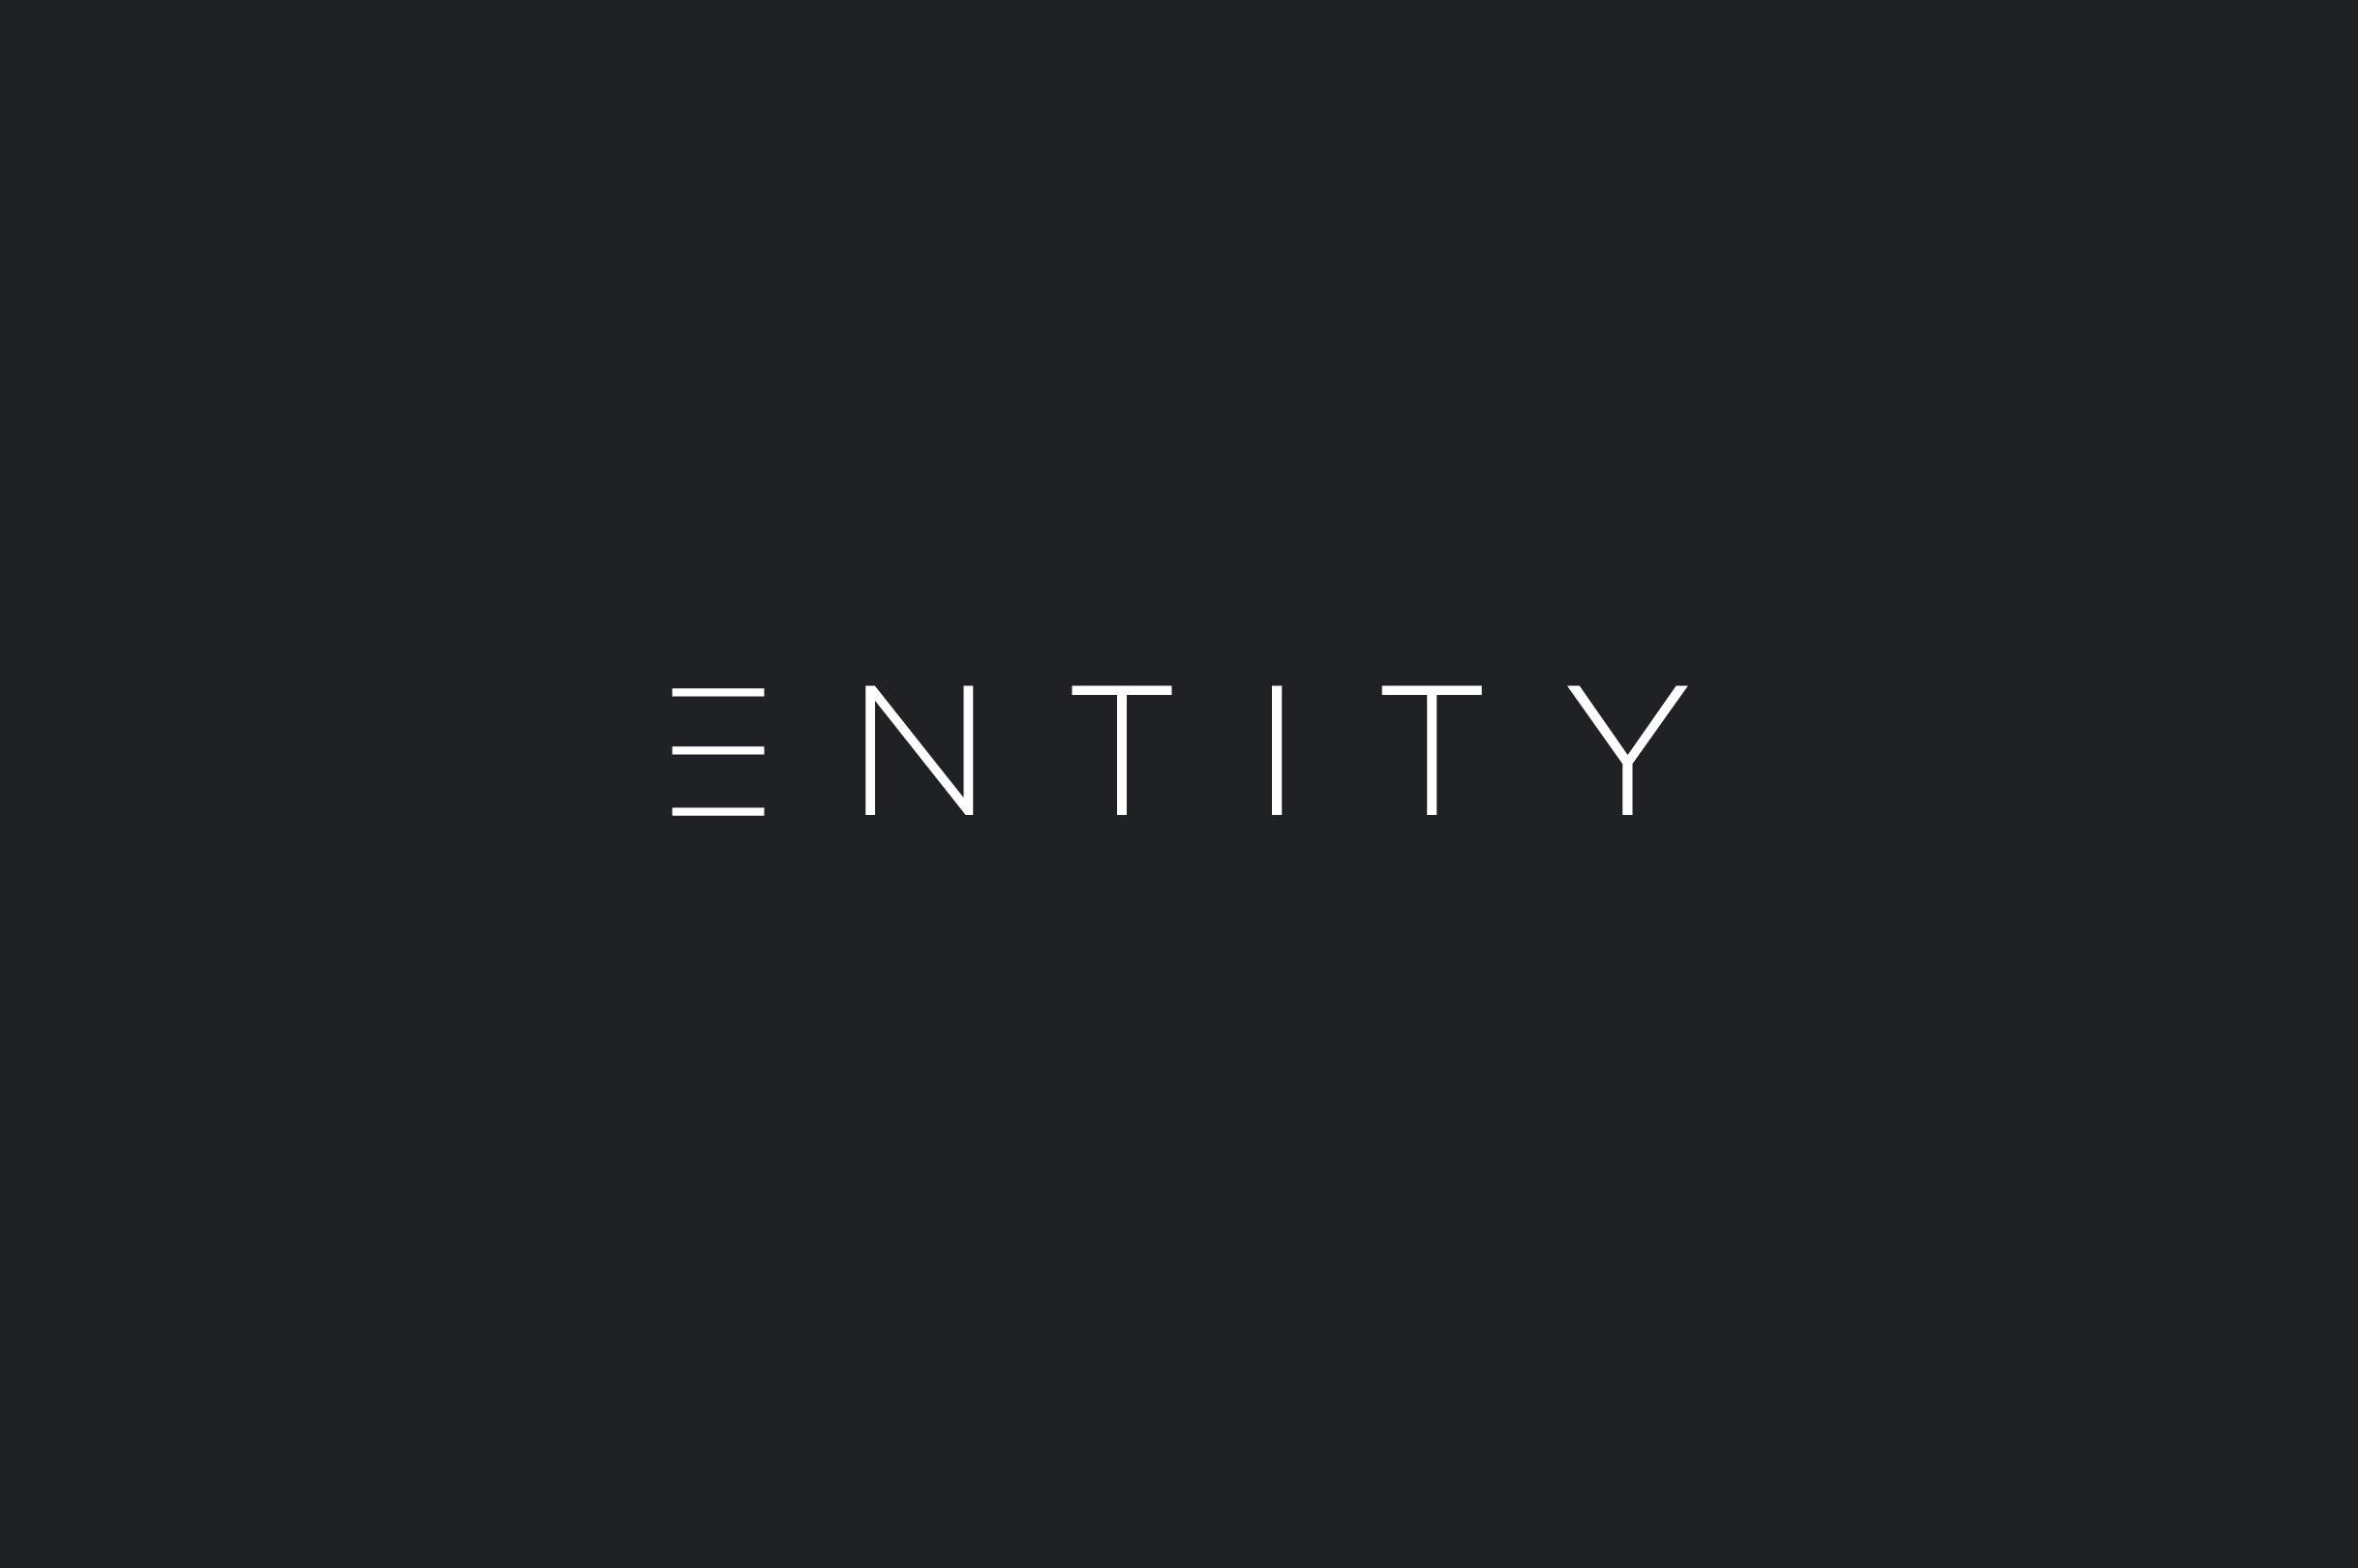 entity.button.png